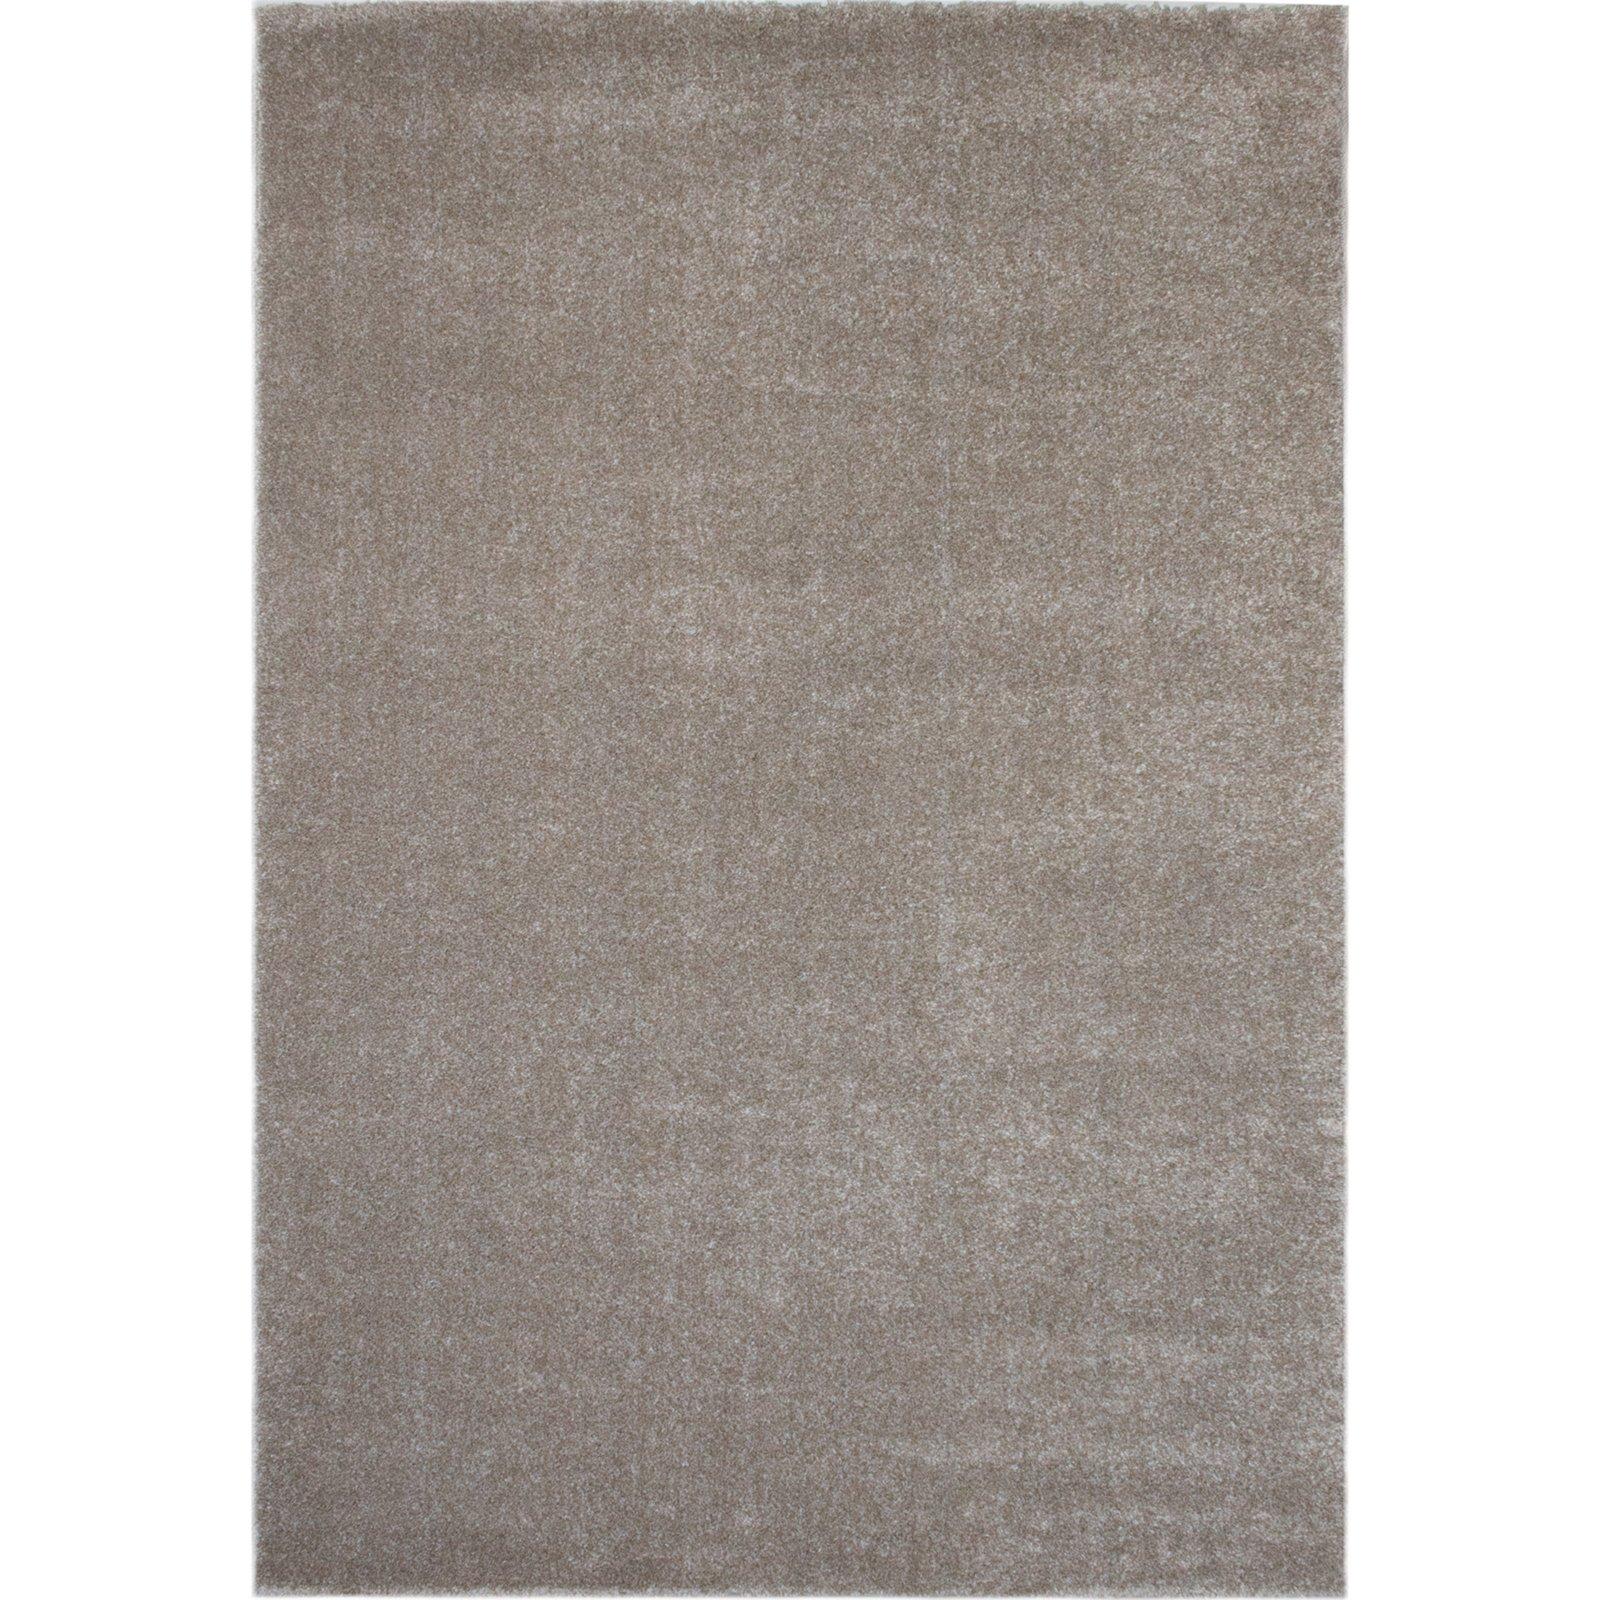 teppich soma beige 120x170 cm einfarbige teppiche. Black Bedroom Furniture Sets. Home Design Ideas